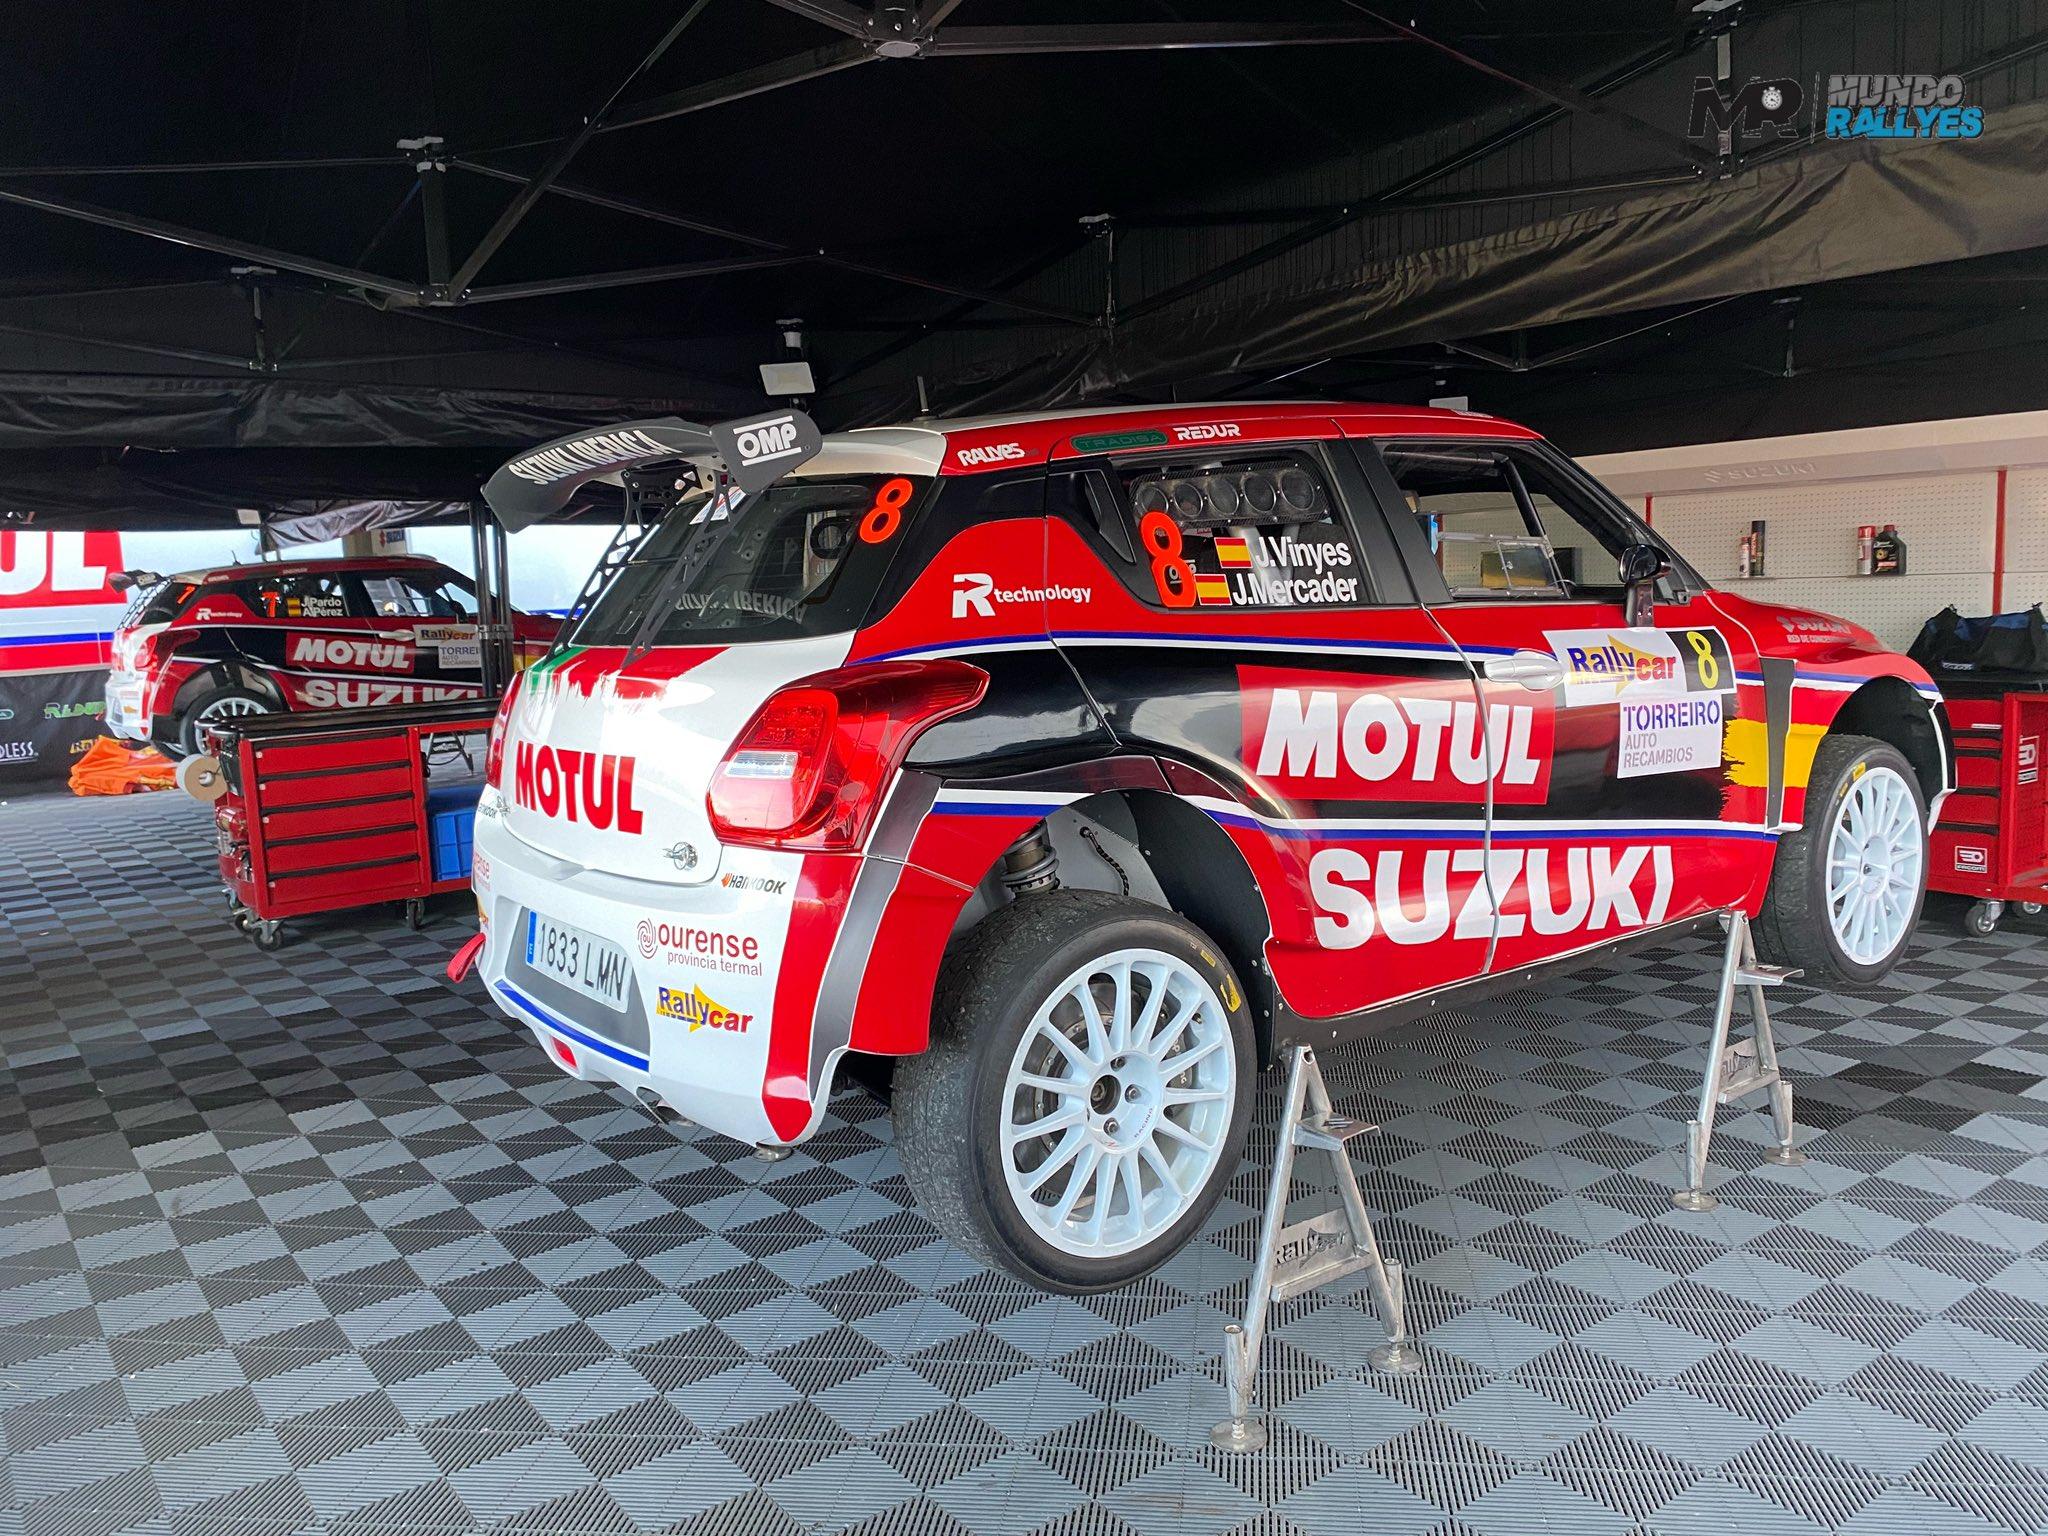 SCER + TER: 52º Rallye de Ferrol - Suzuki [20-21 Agosto] E9N5SbSXMAEtV2n?format=jpg&name=large